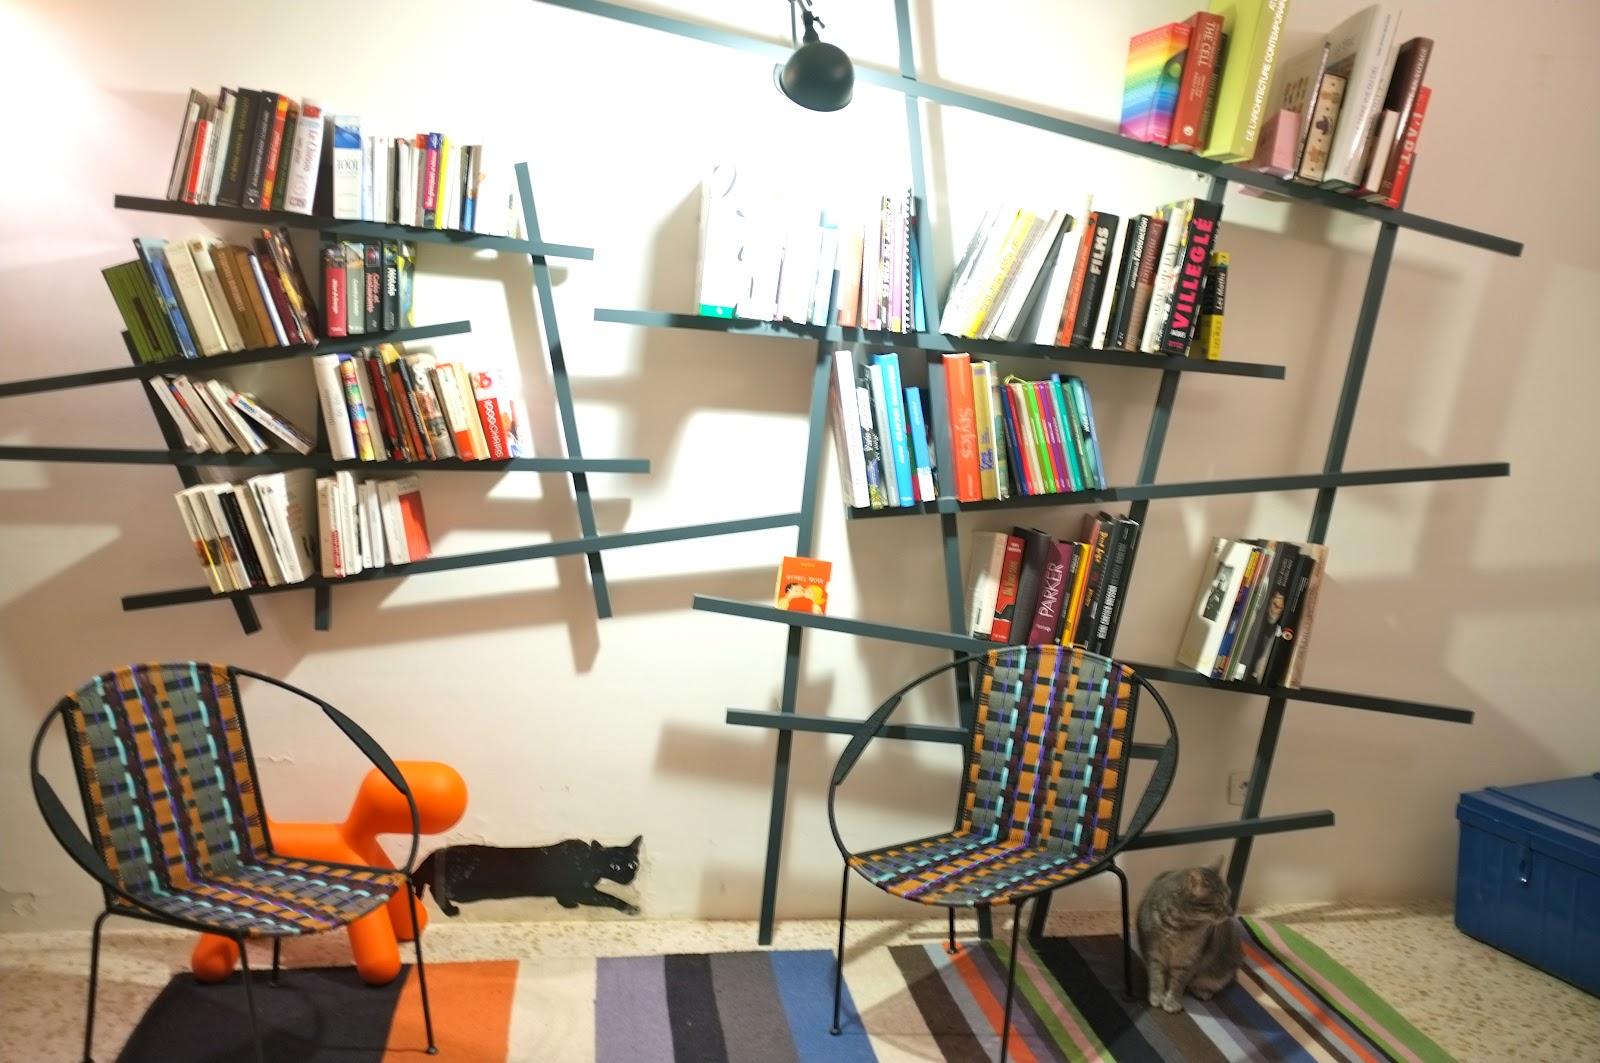 mon coin lecture design boh decoration lifestyle. Black Bedroom Furniture Sets. Home Design Ideas